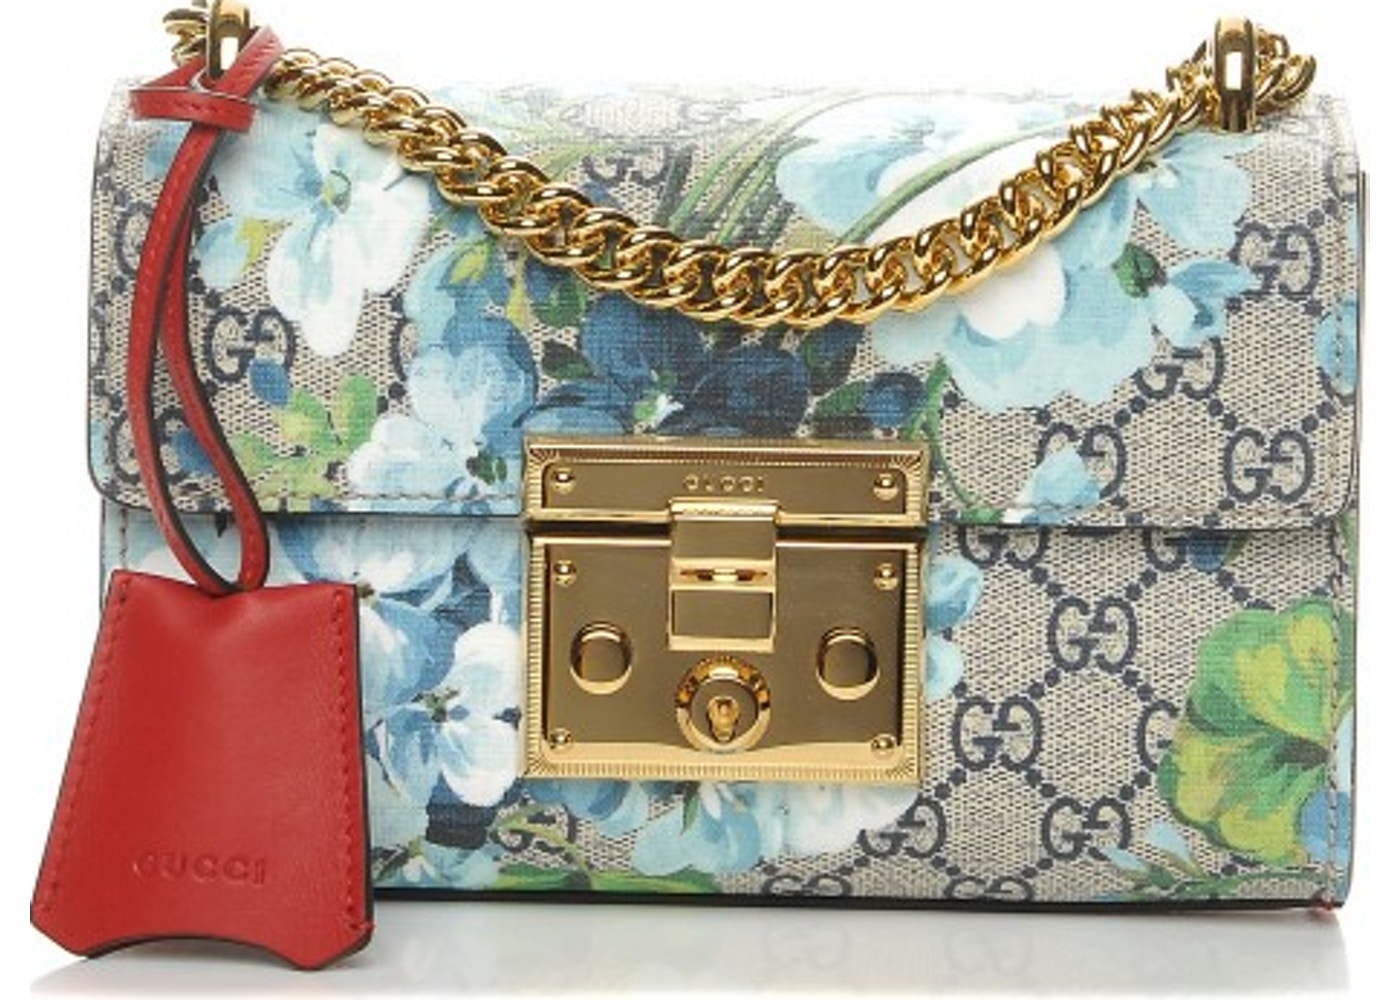 018305295903 Gucci Padlock Shoulder Bag Blooms GG Supreme Small Blue/Red ...